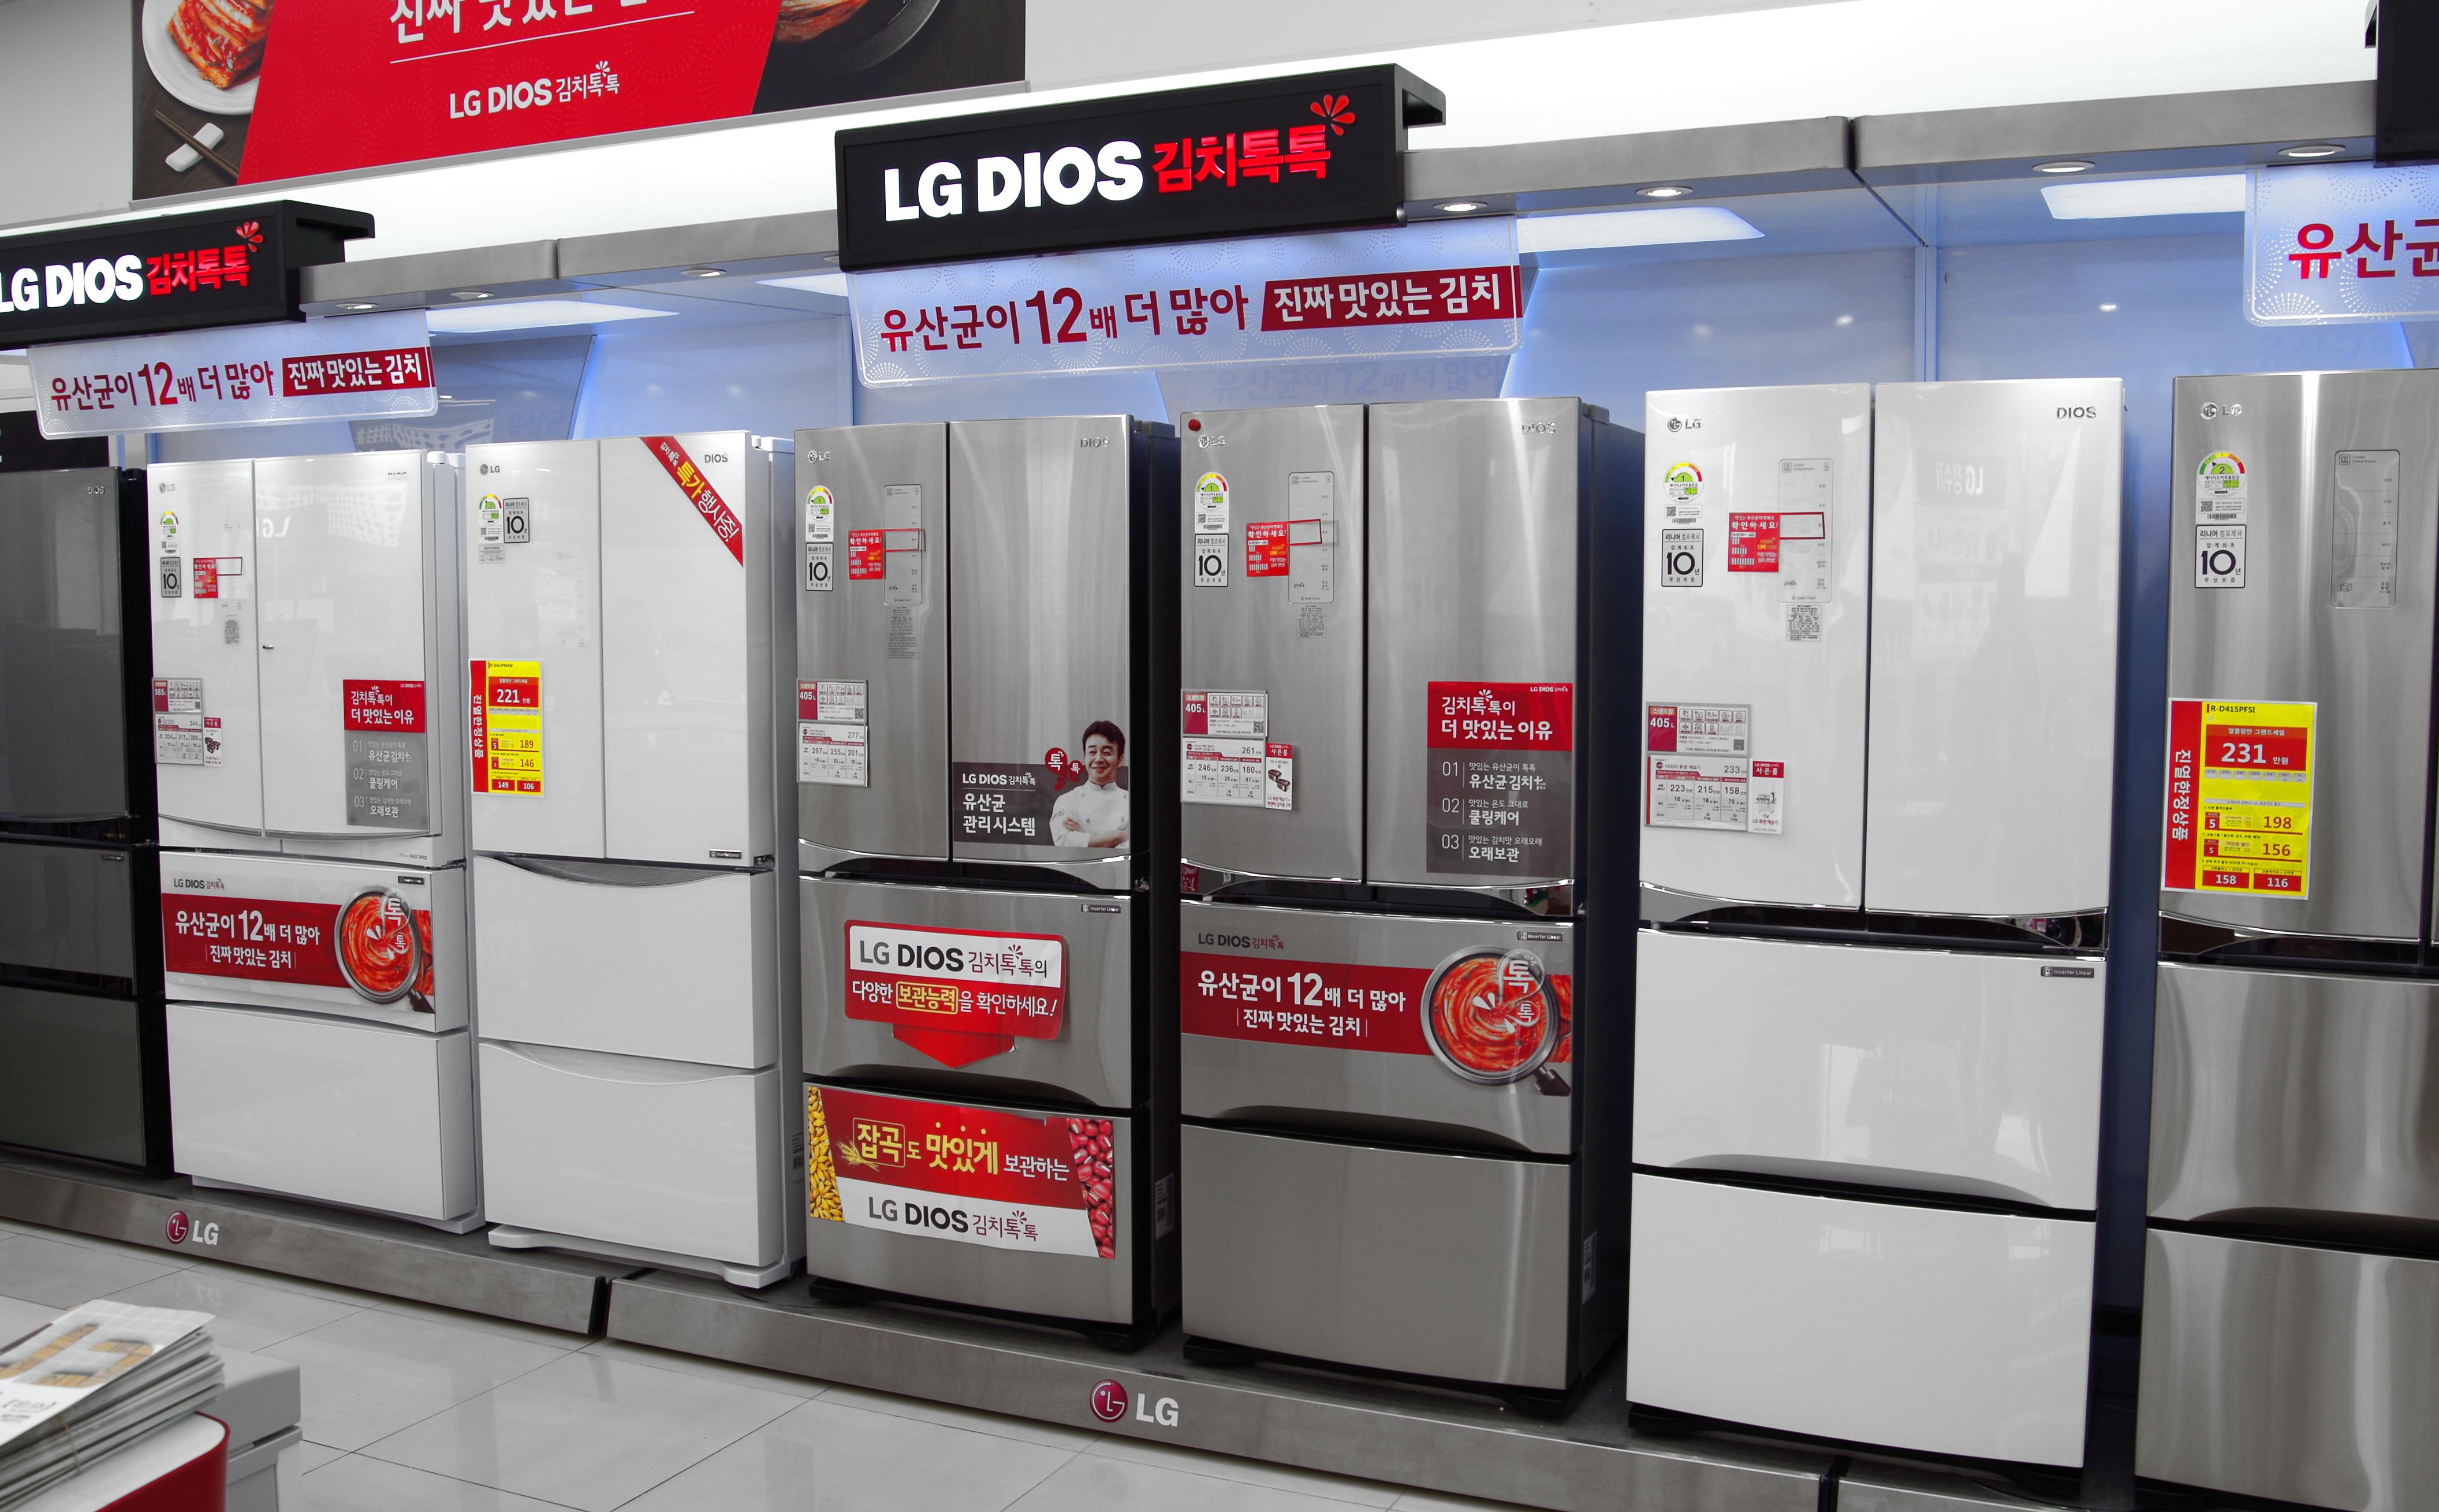 Best Counter Depth Refrigerator 2015 >> Kimchi Refrigerators Are Key to Korean Cuisine - Reviewed ...